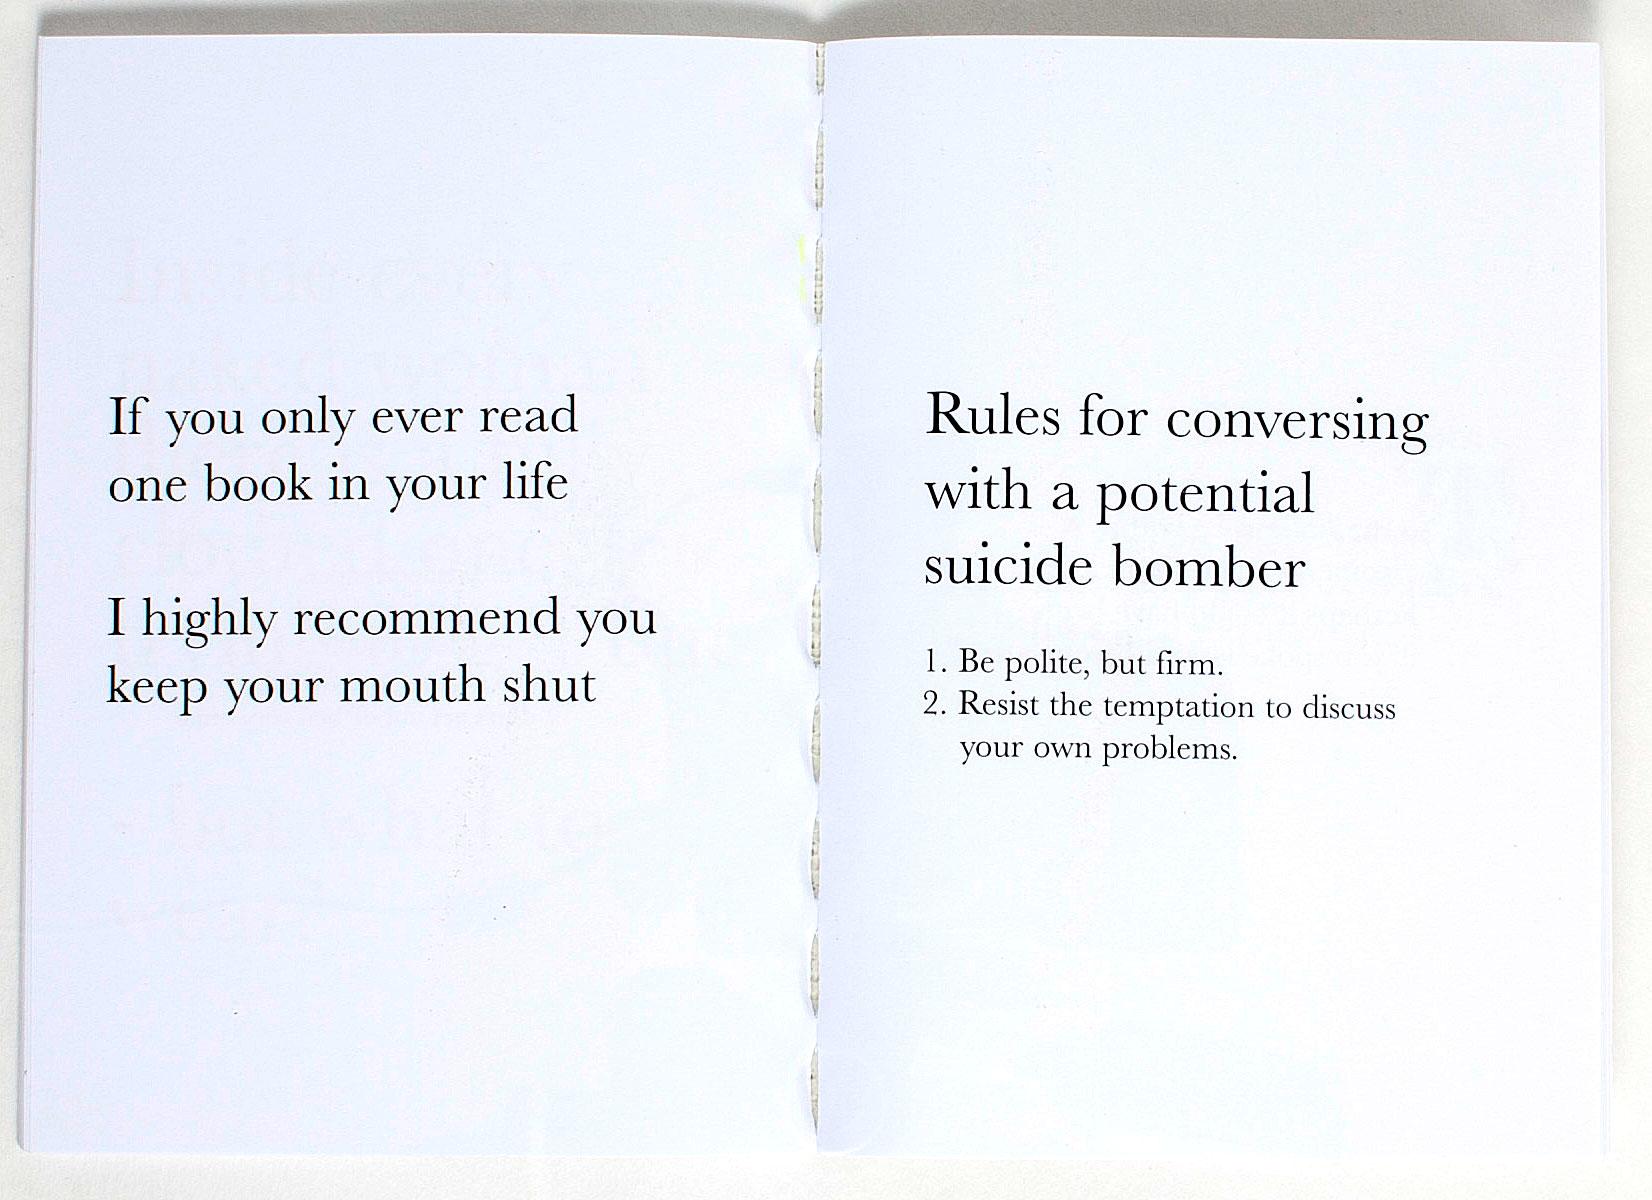 epm-print-management-bristol-comedy-books-3.jpg